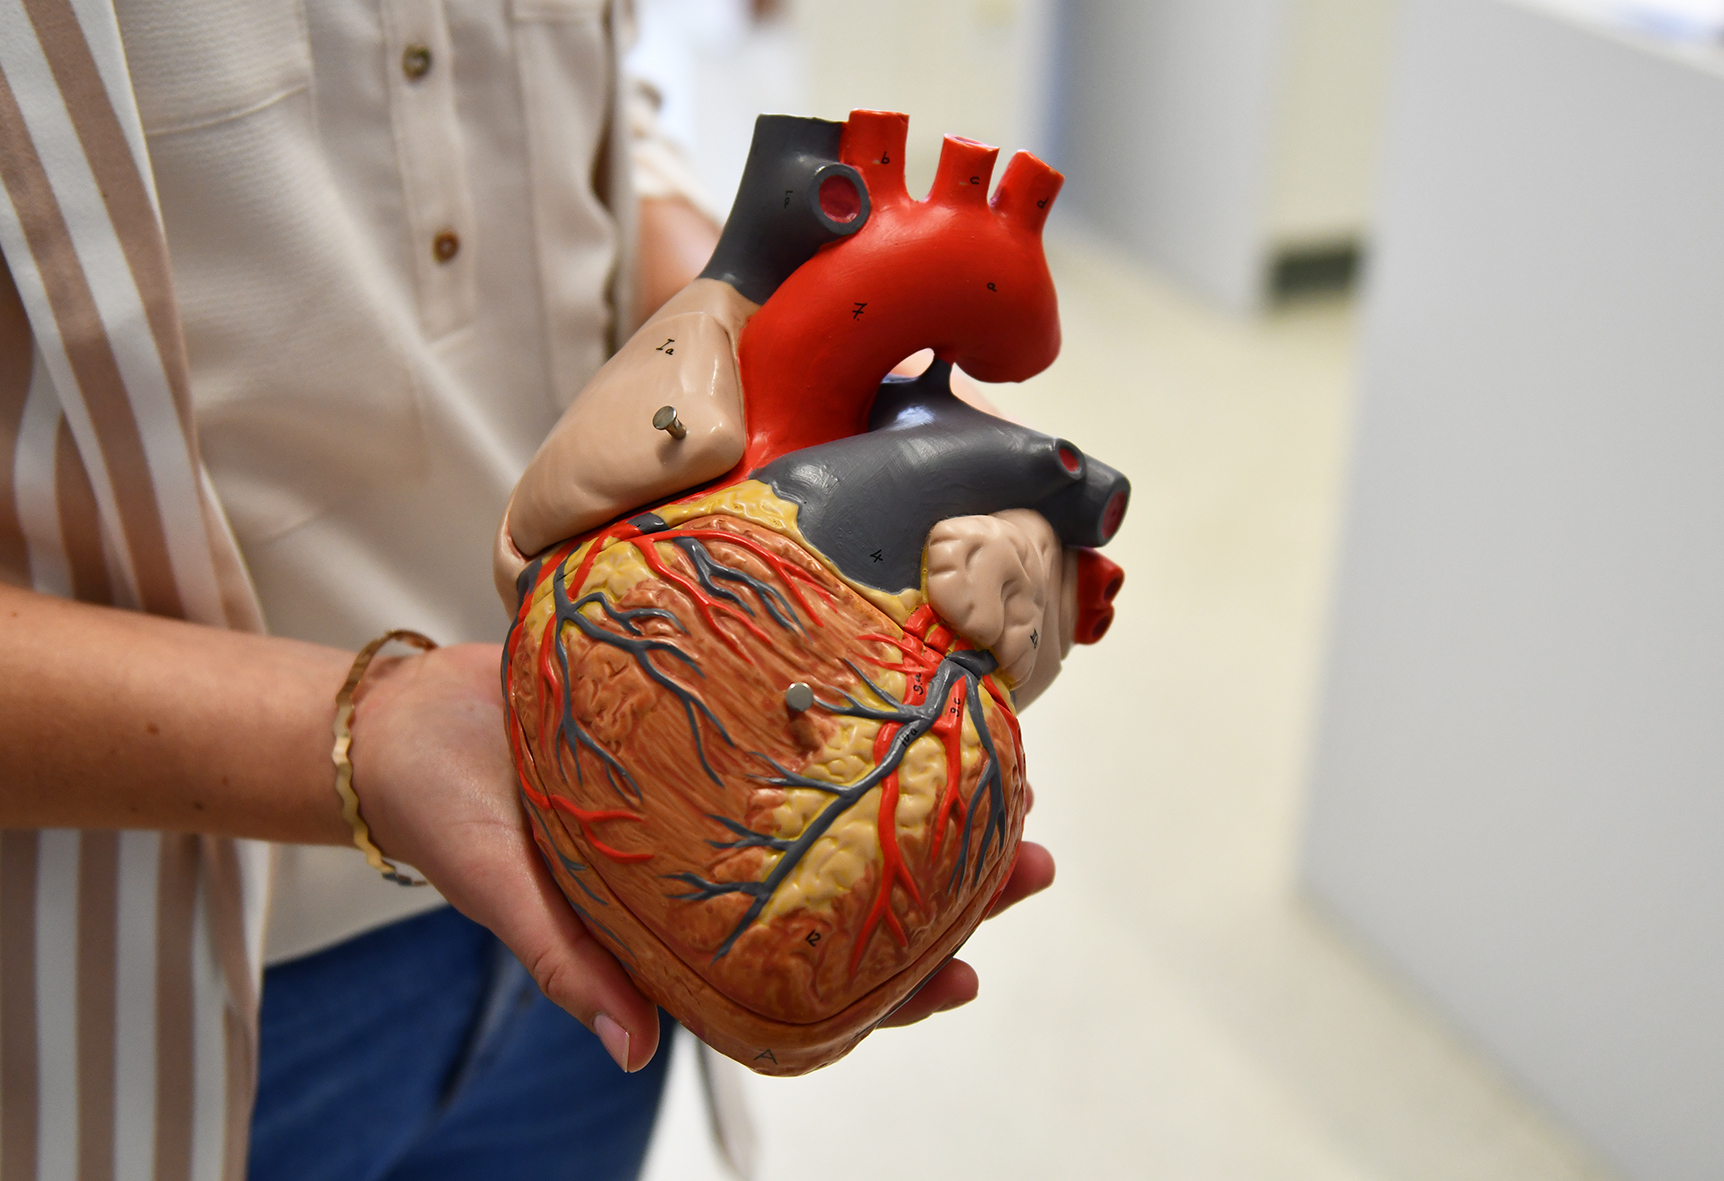 Modell des Herzens